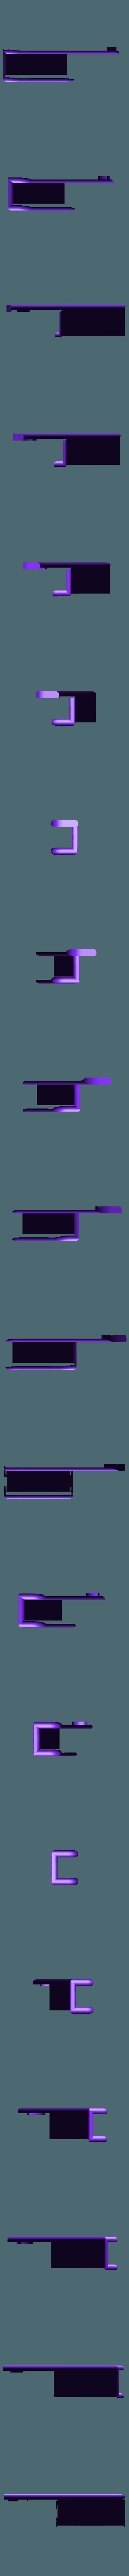 ArmLeft.stl Download free STL file iPad Tripod Support for TikTok Kids • 3D printable template, michelj